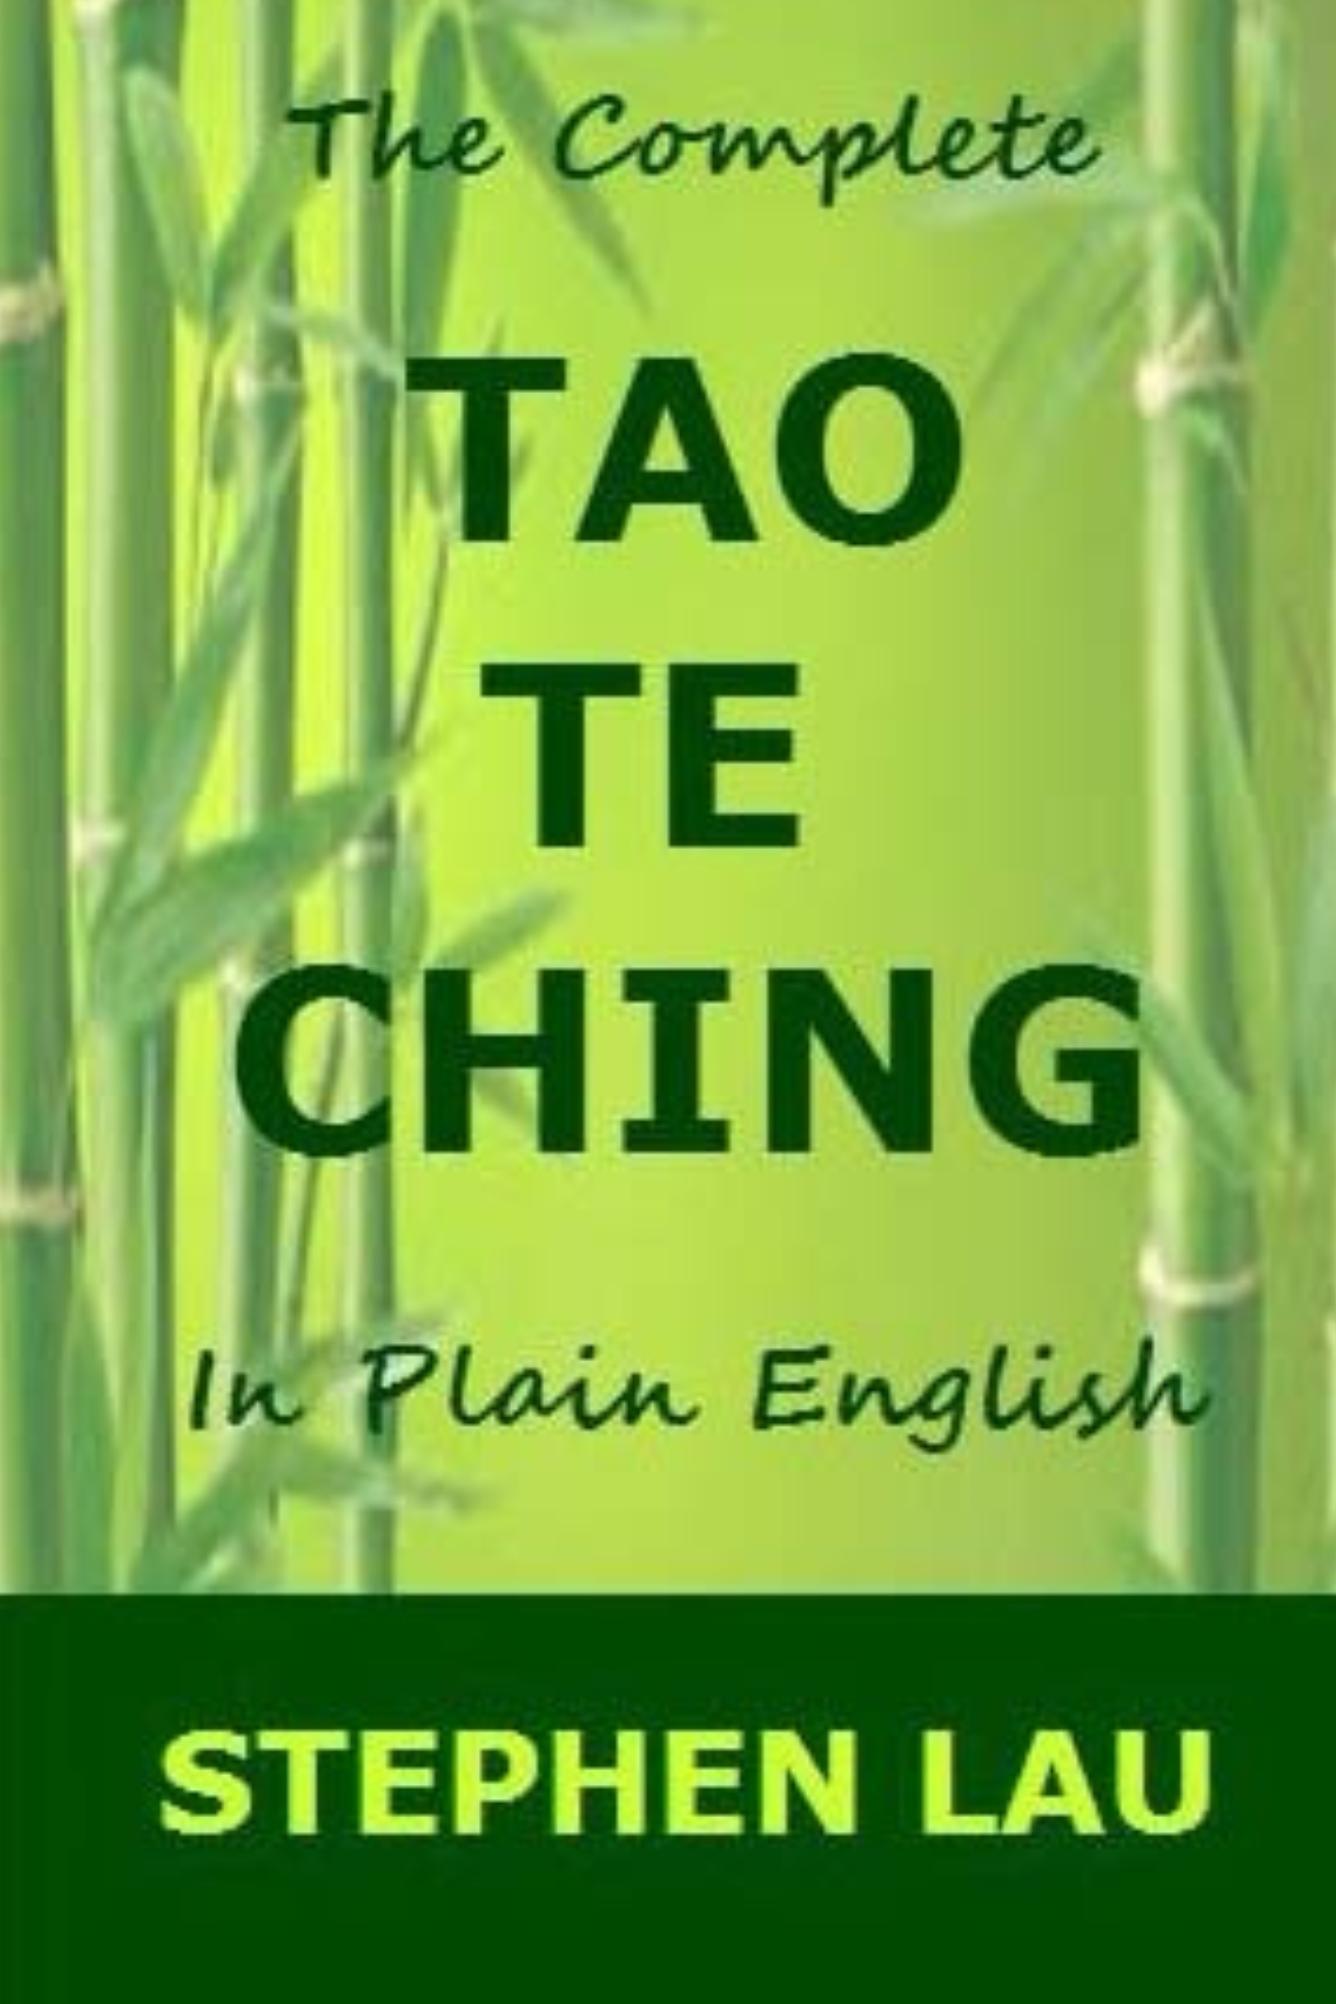 Complete Tao Te Ching